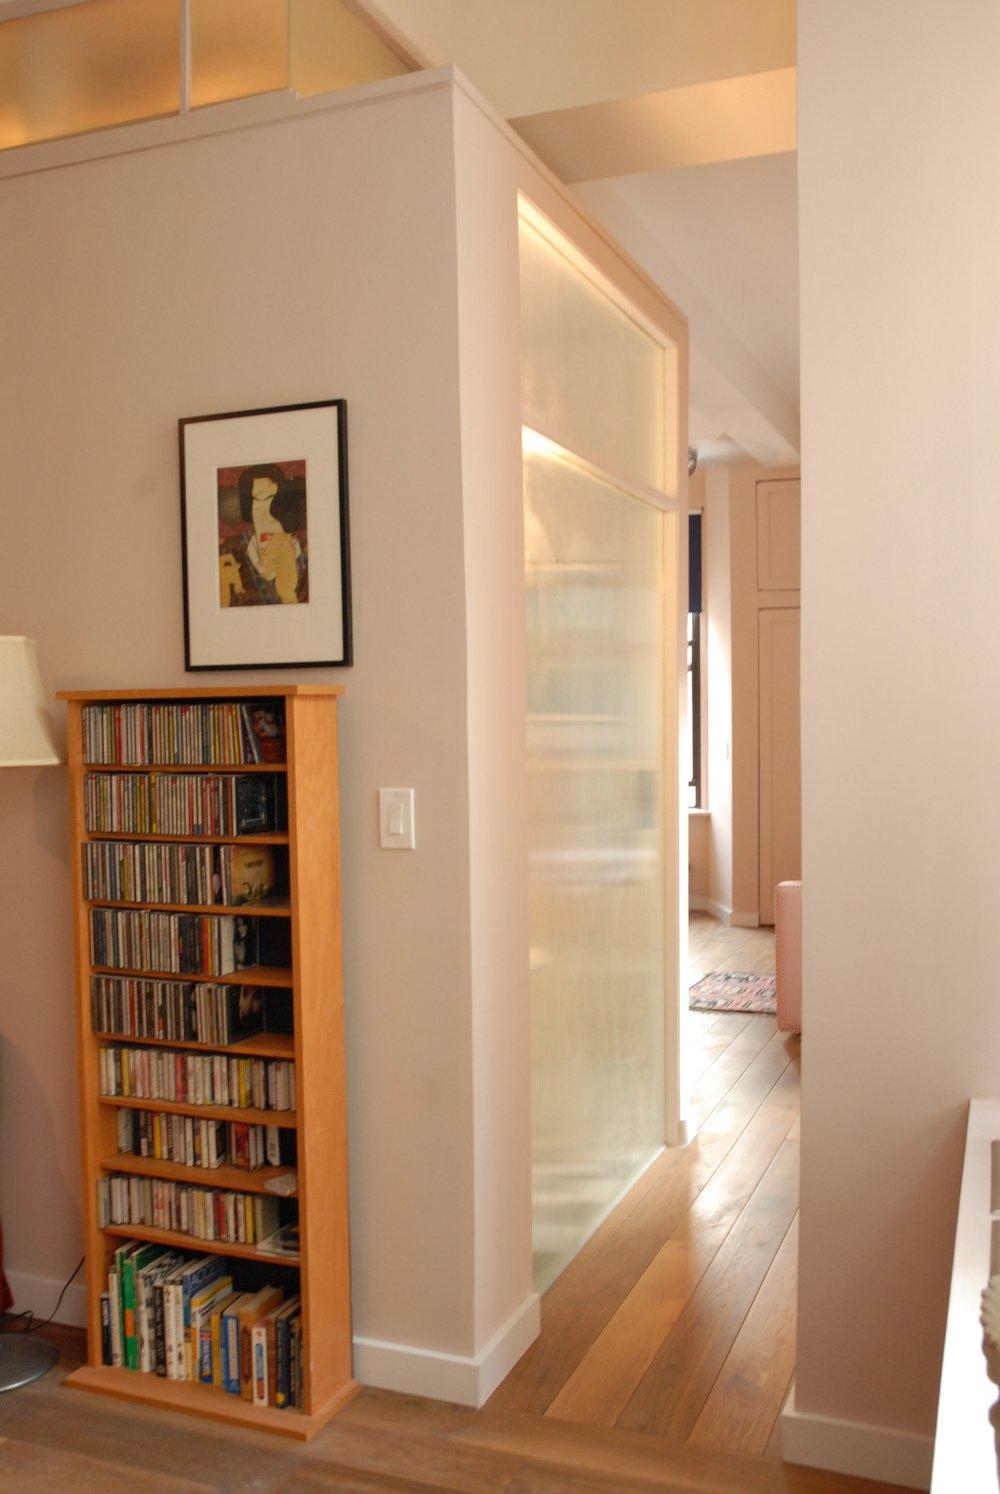 3Hanover hallway.JPG